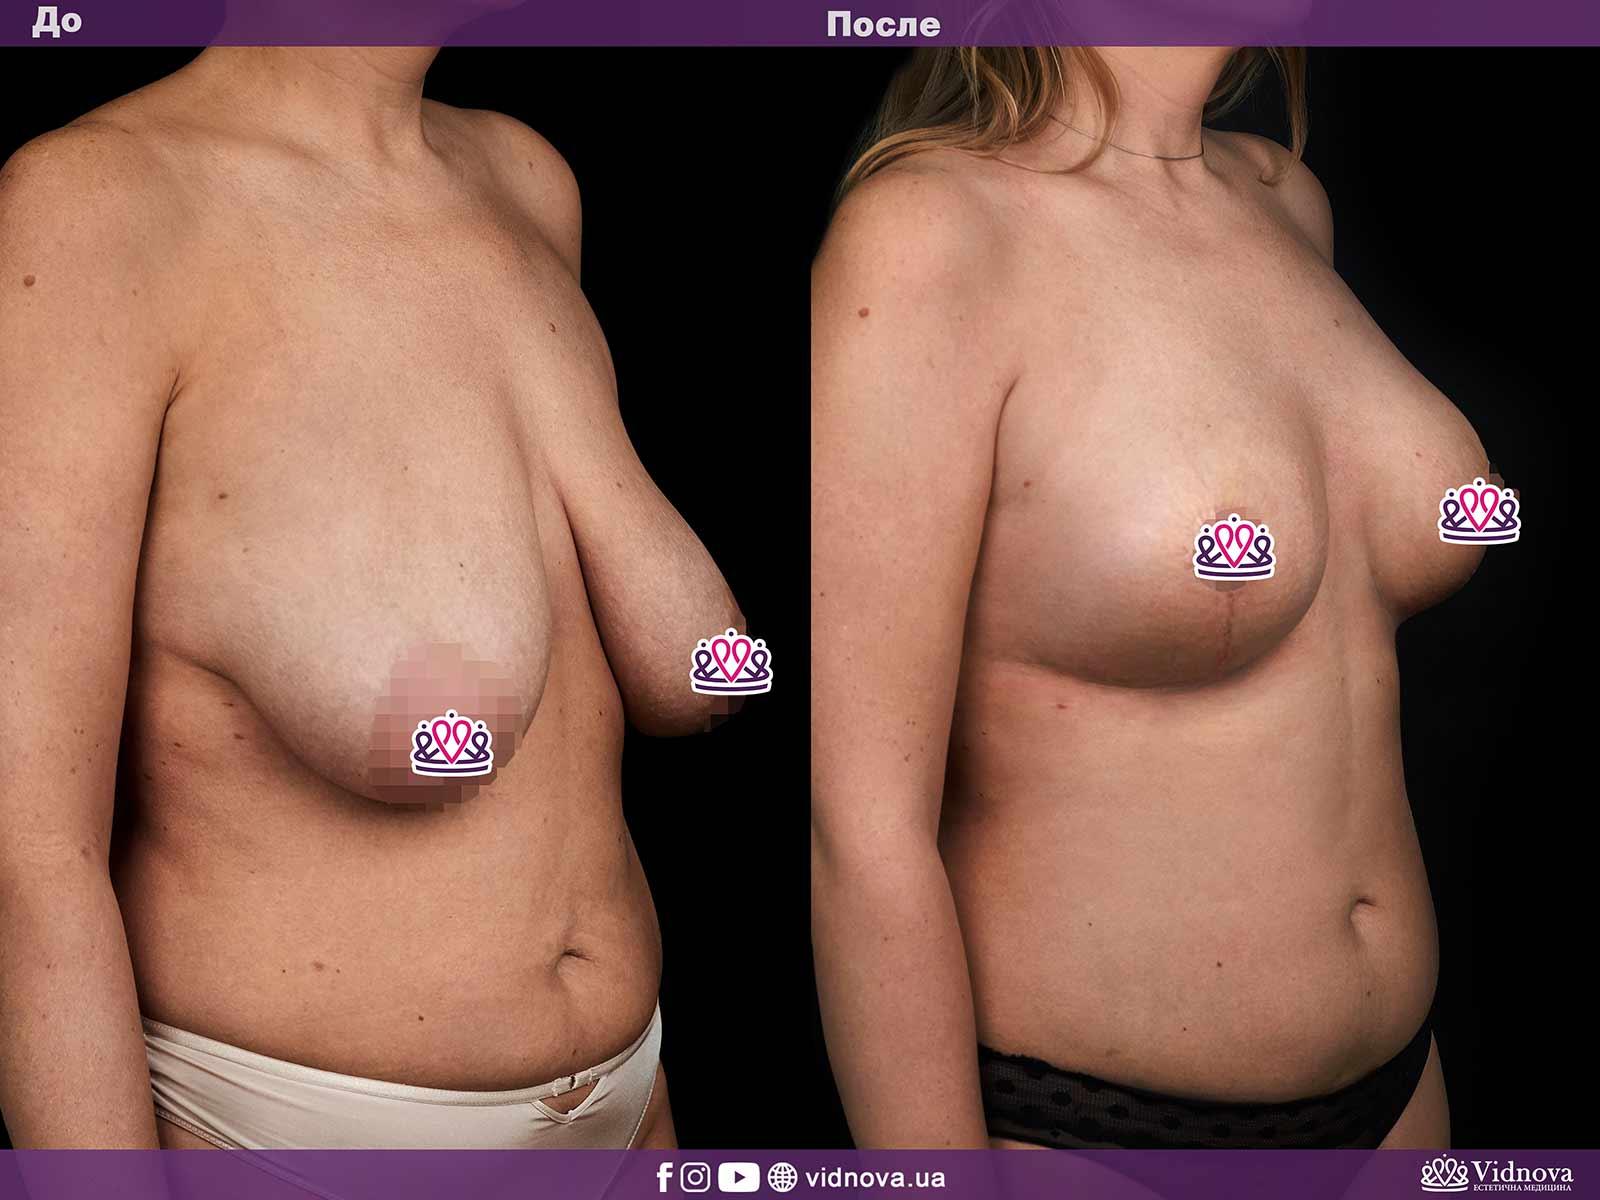 Подтяжка груди: Фото ДО и ПОСЛЕ - Пример №4-2 - Клиника Vidnova